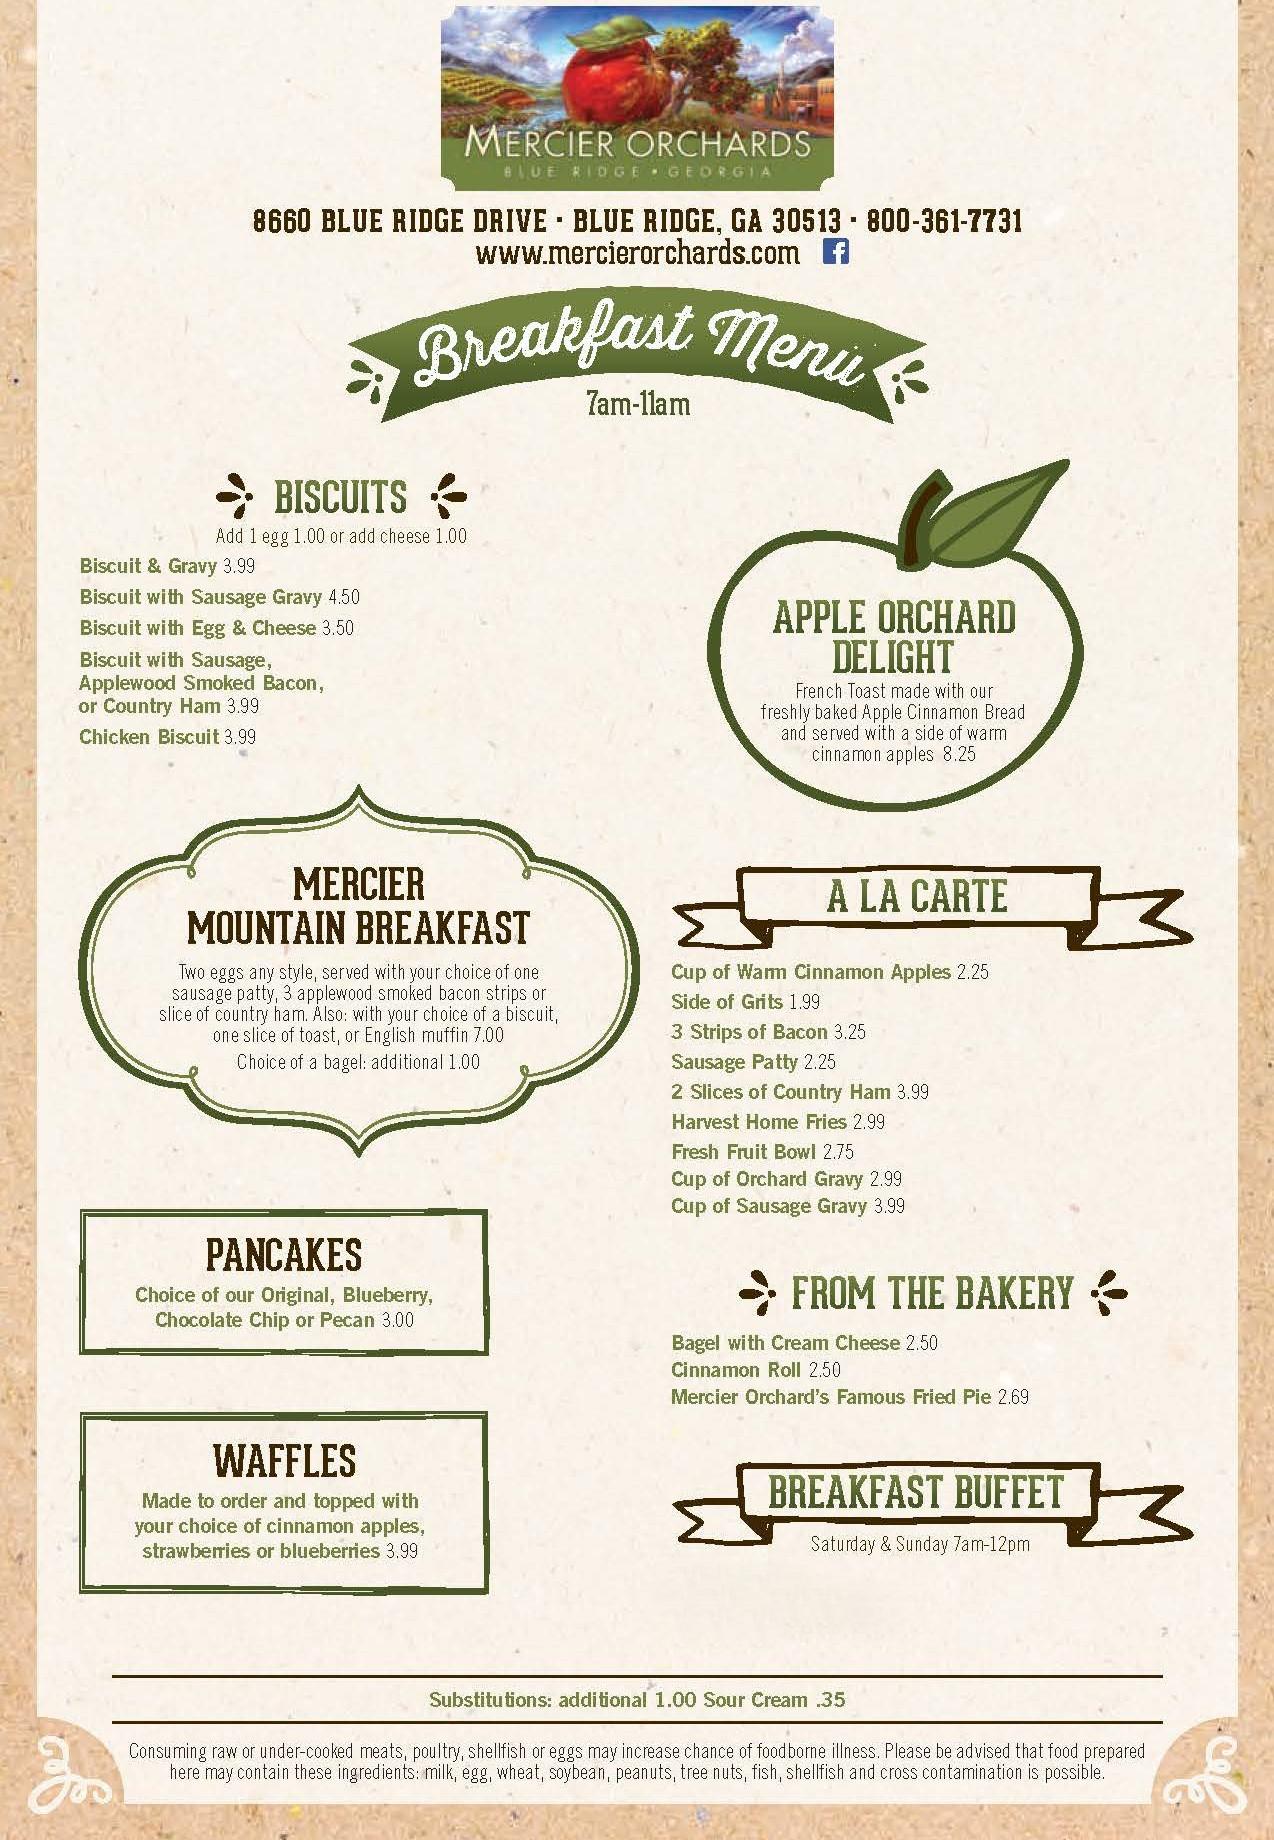 mercier-orchard-breakfast-menu-11919.jpg